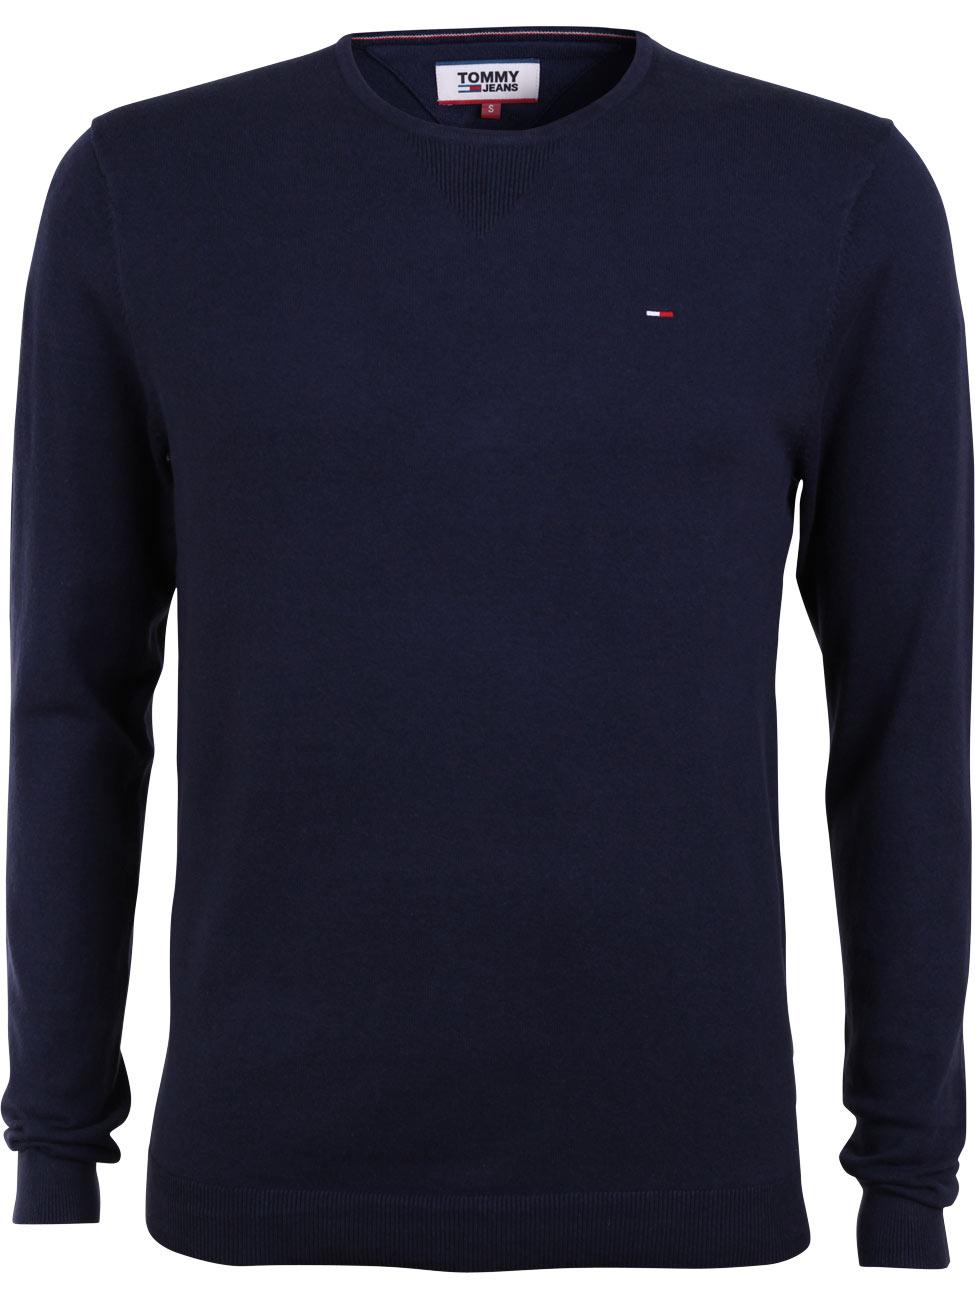 Tommy Hilfiger Herren Pullover TJM Original Crew-Neck Sweater   eBay 1d2fdae871